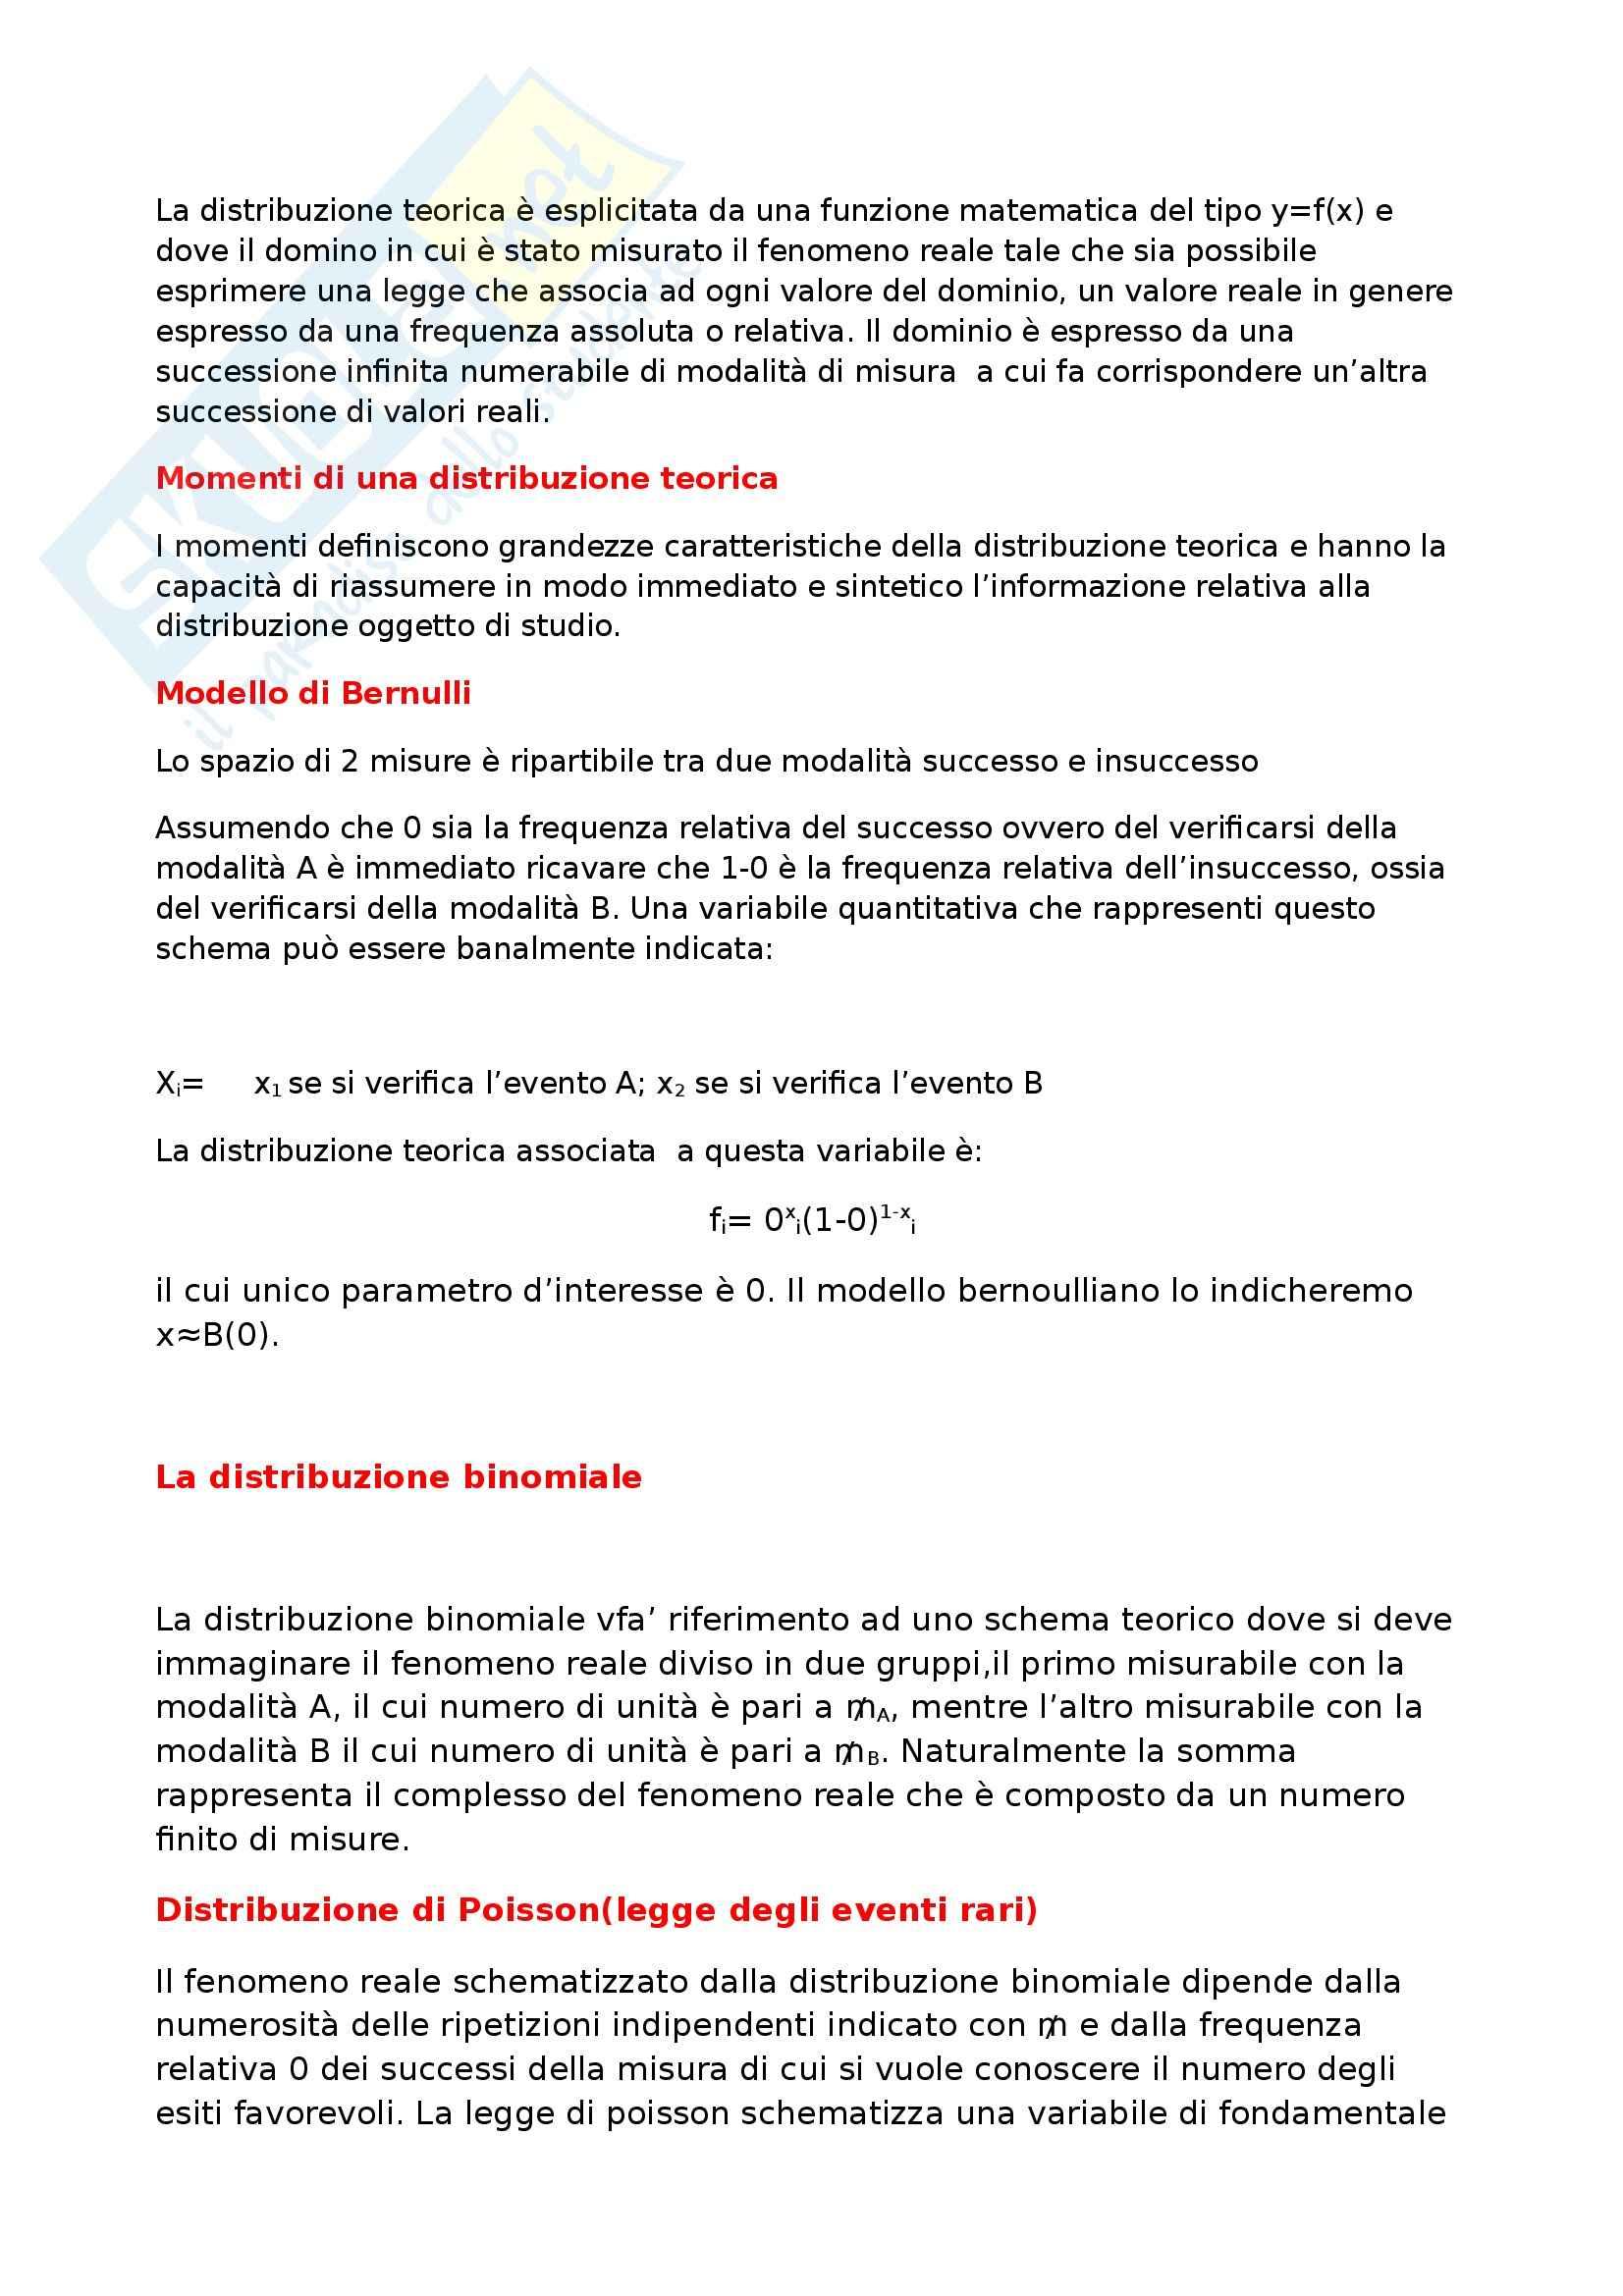 Riassunto esame Statistica, prof. Di Battista Pag. 6